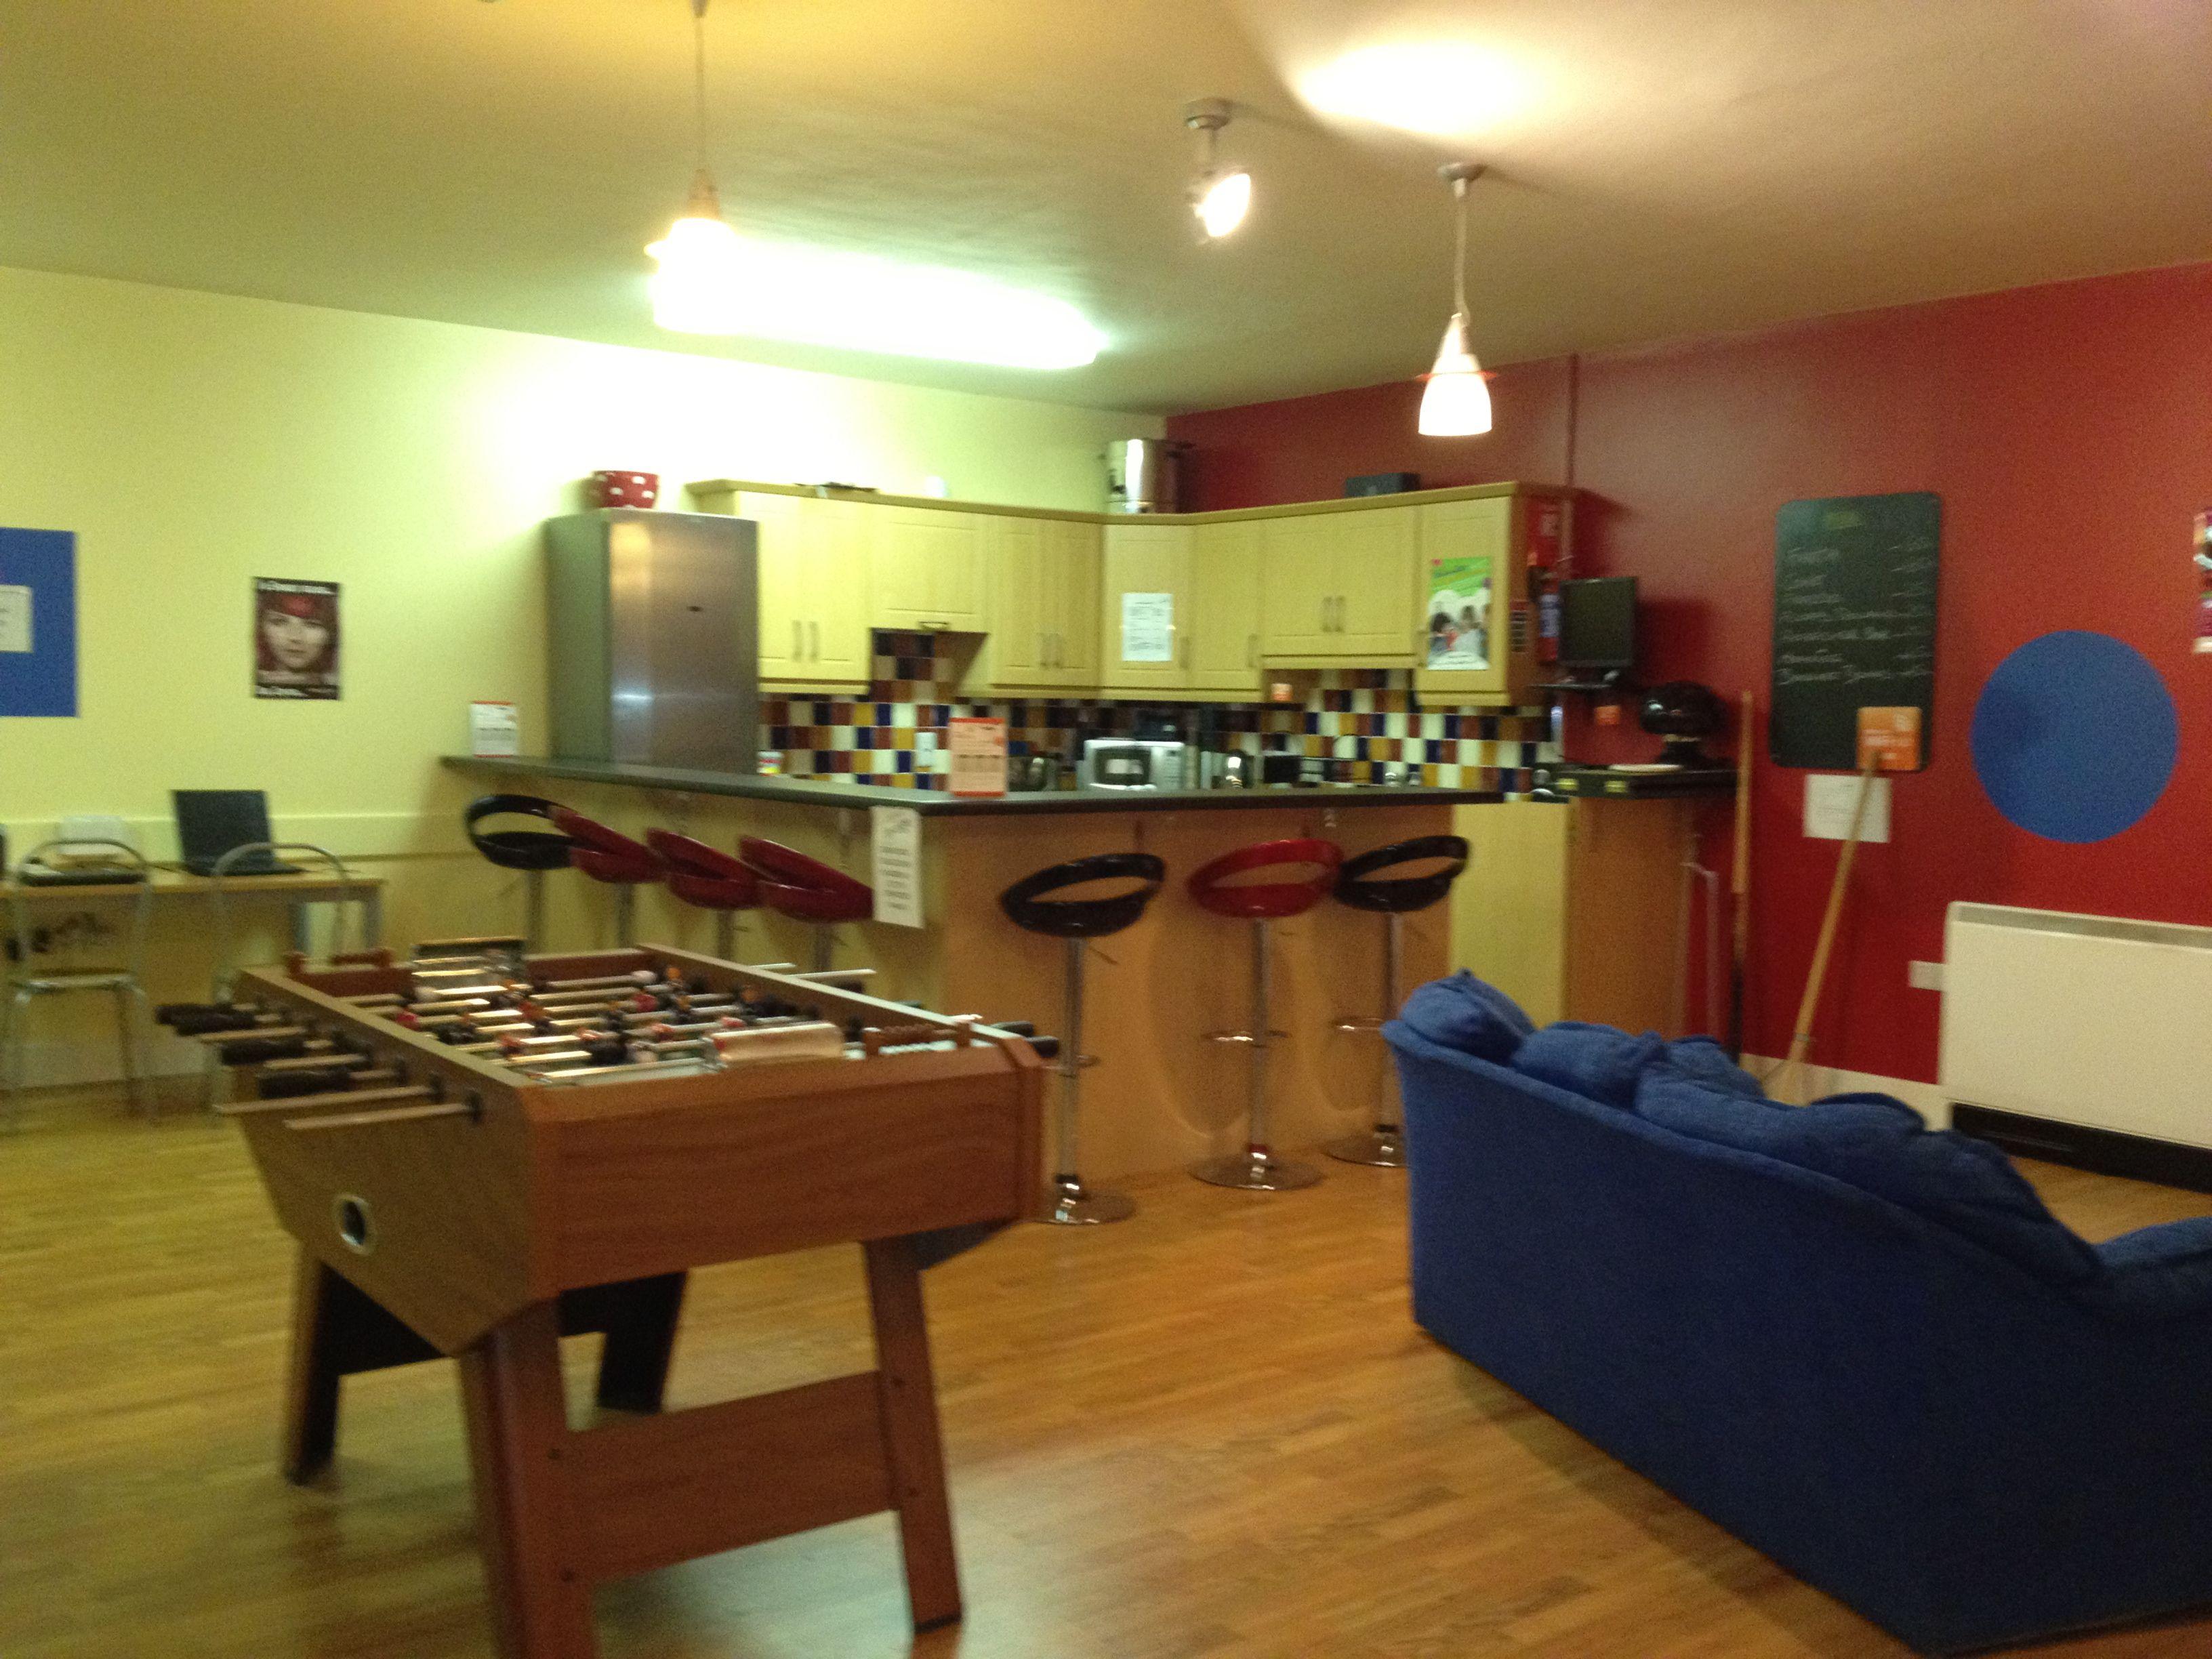 Decorating ideas pinterest joy studio design - Youth Cafe